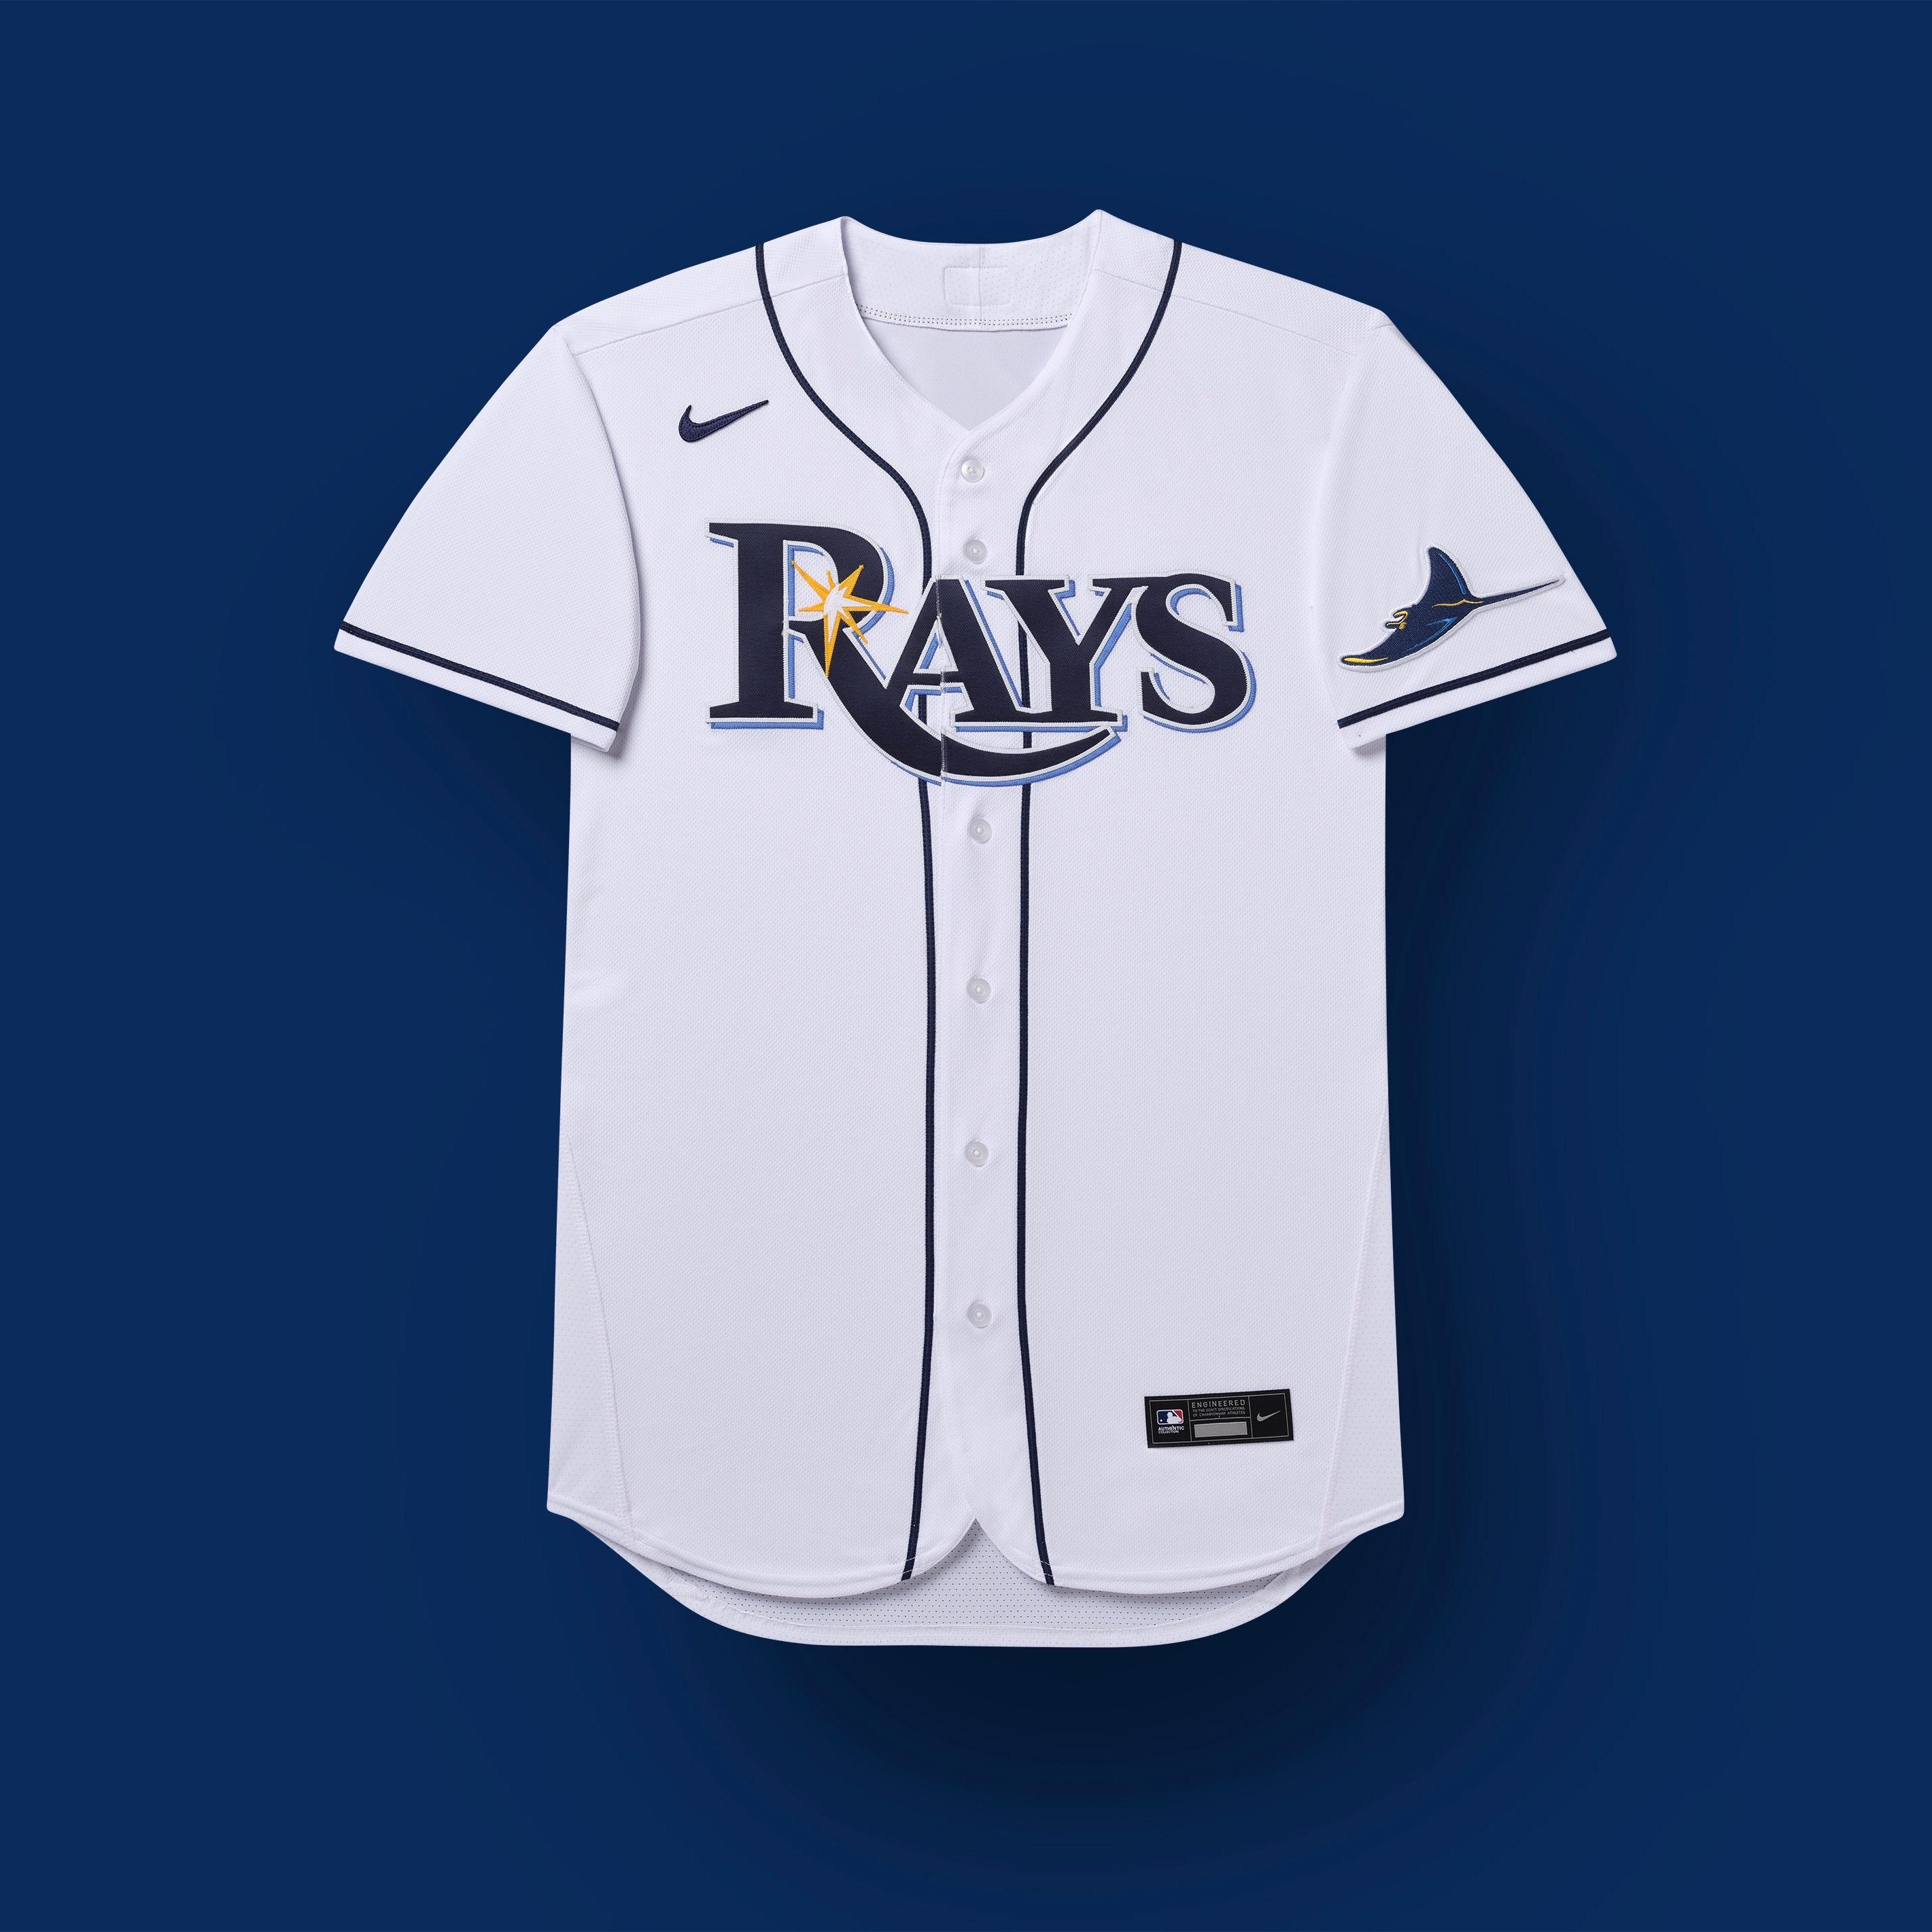 uniformes de tampa bay rays 2020